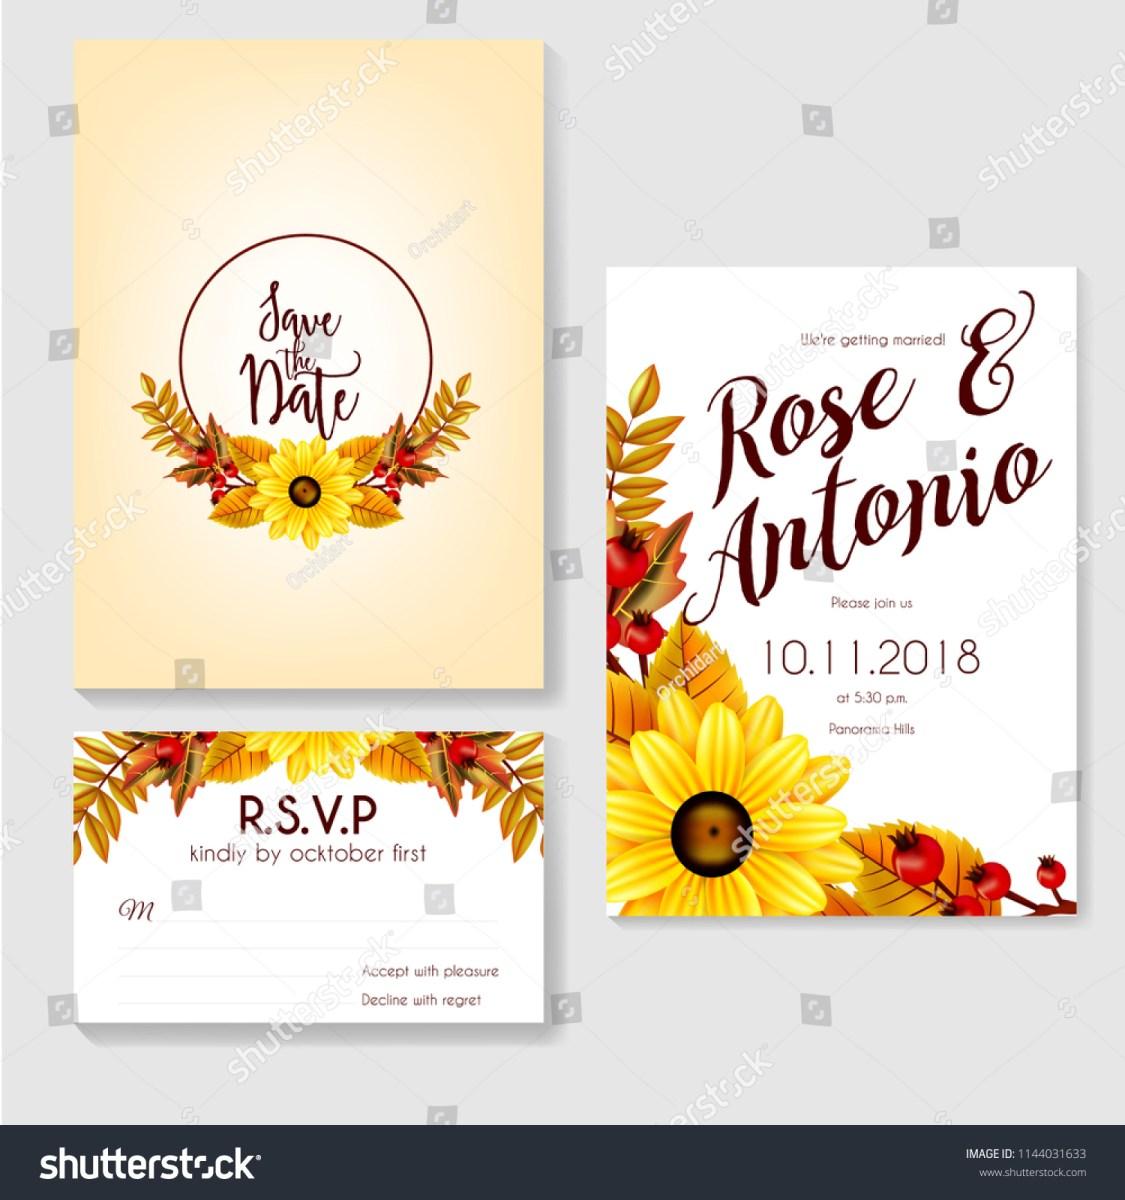 Fall Wedding Invitation Autumn Fall Wedding Invitation Made Flowers Stock Vector Royalty